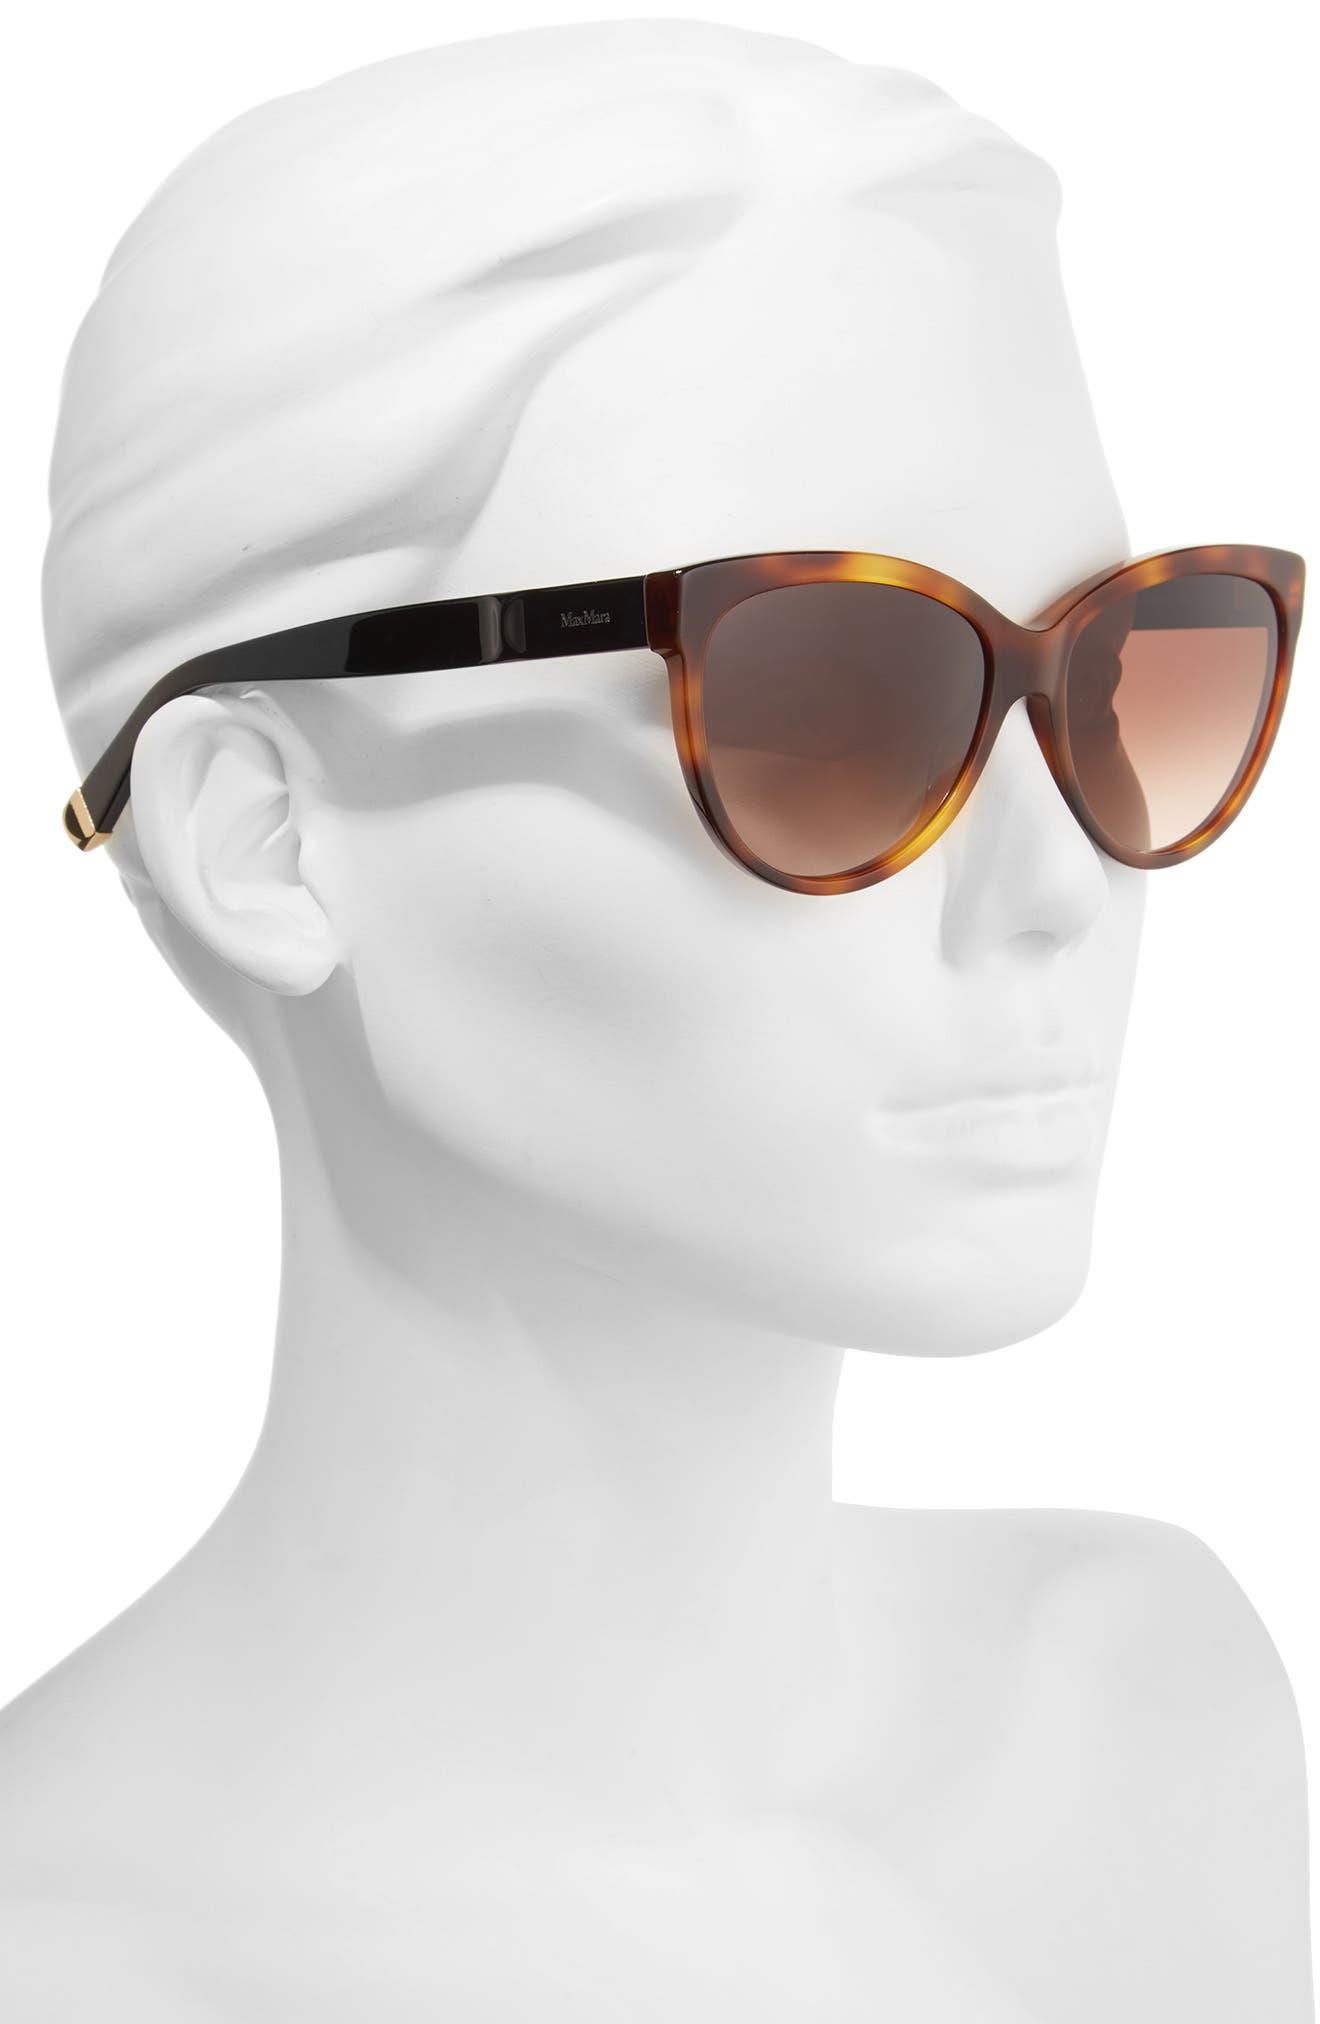 Moderii 57mm Gradient Cat Eye Sunglasses,                             Alternate thumbnail 4, color,